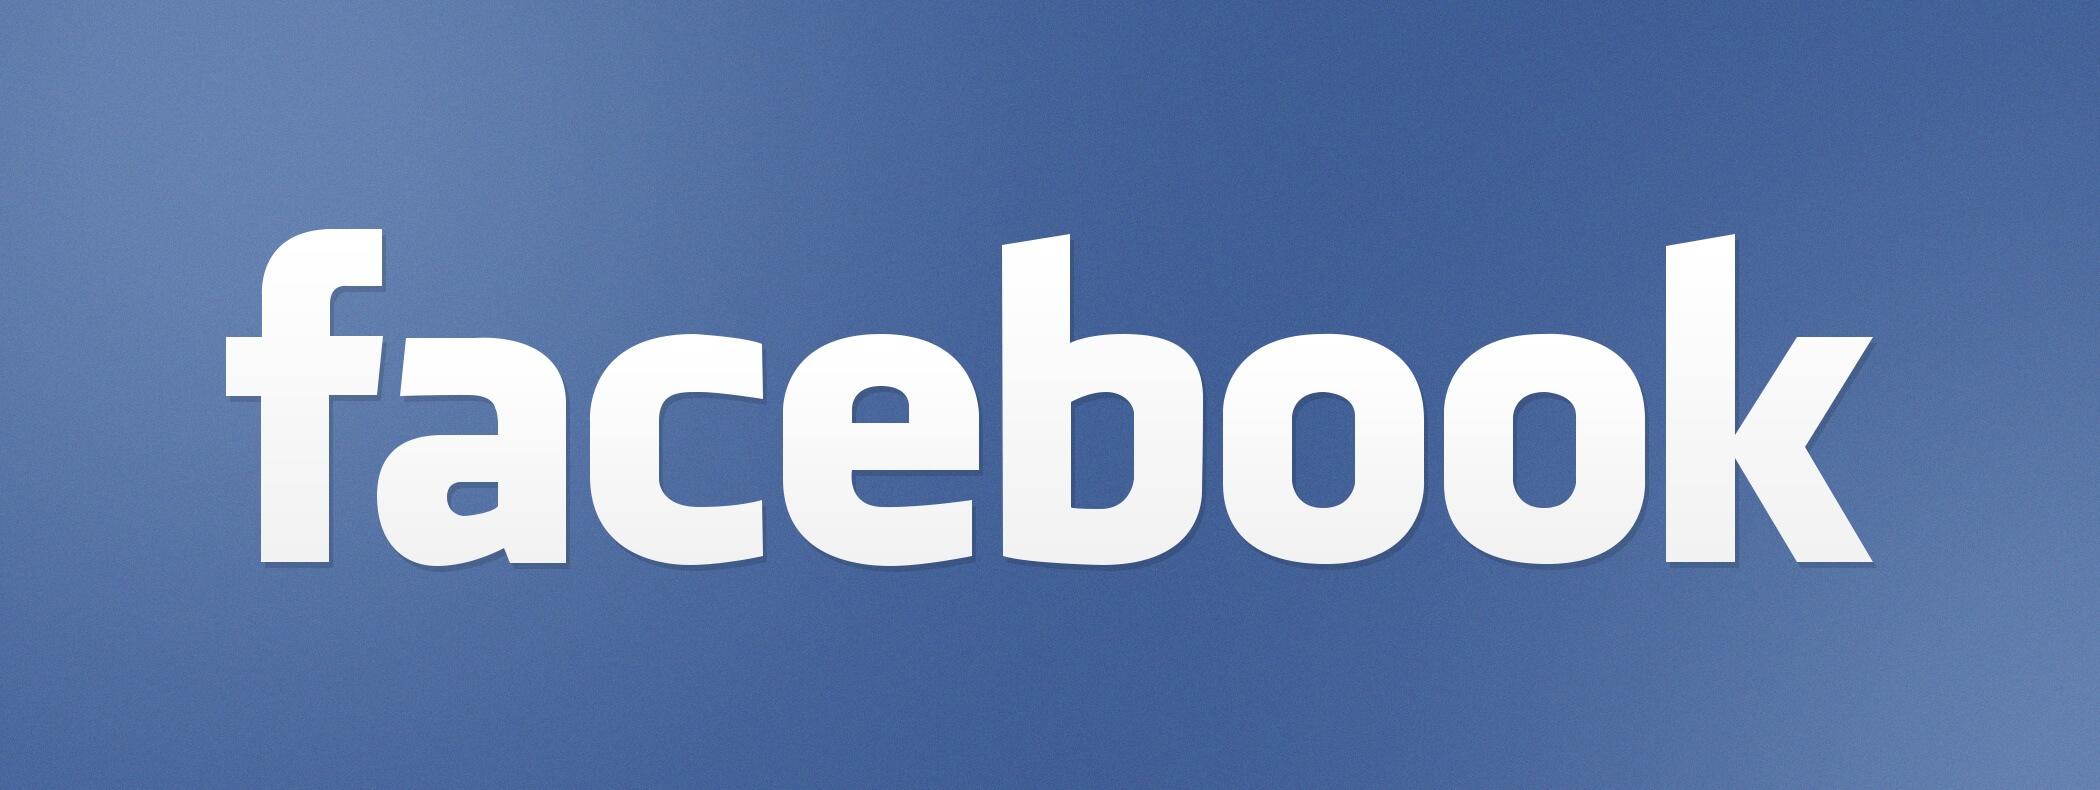 Using Facebook efficiently for inbound marketing - for Business